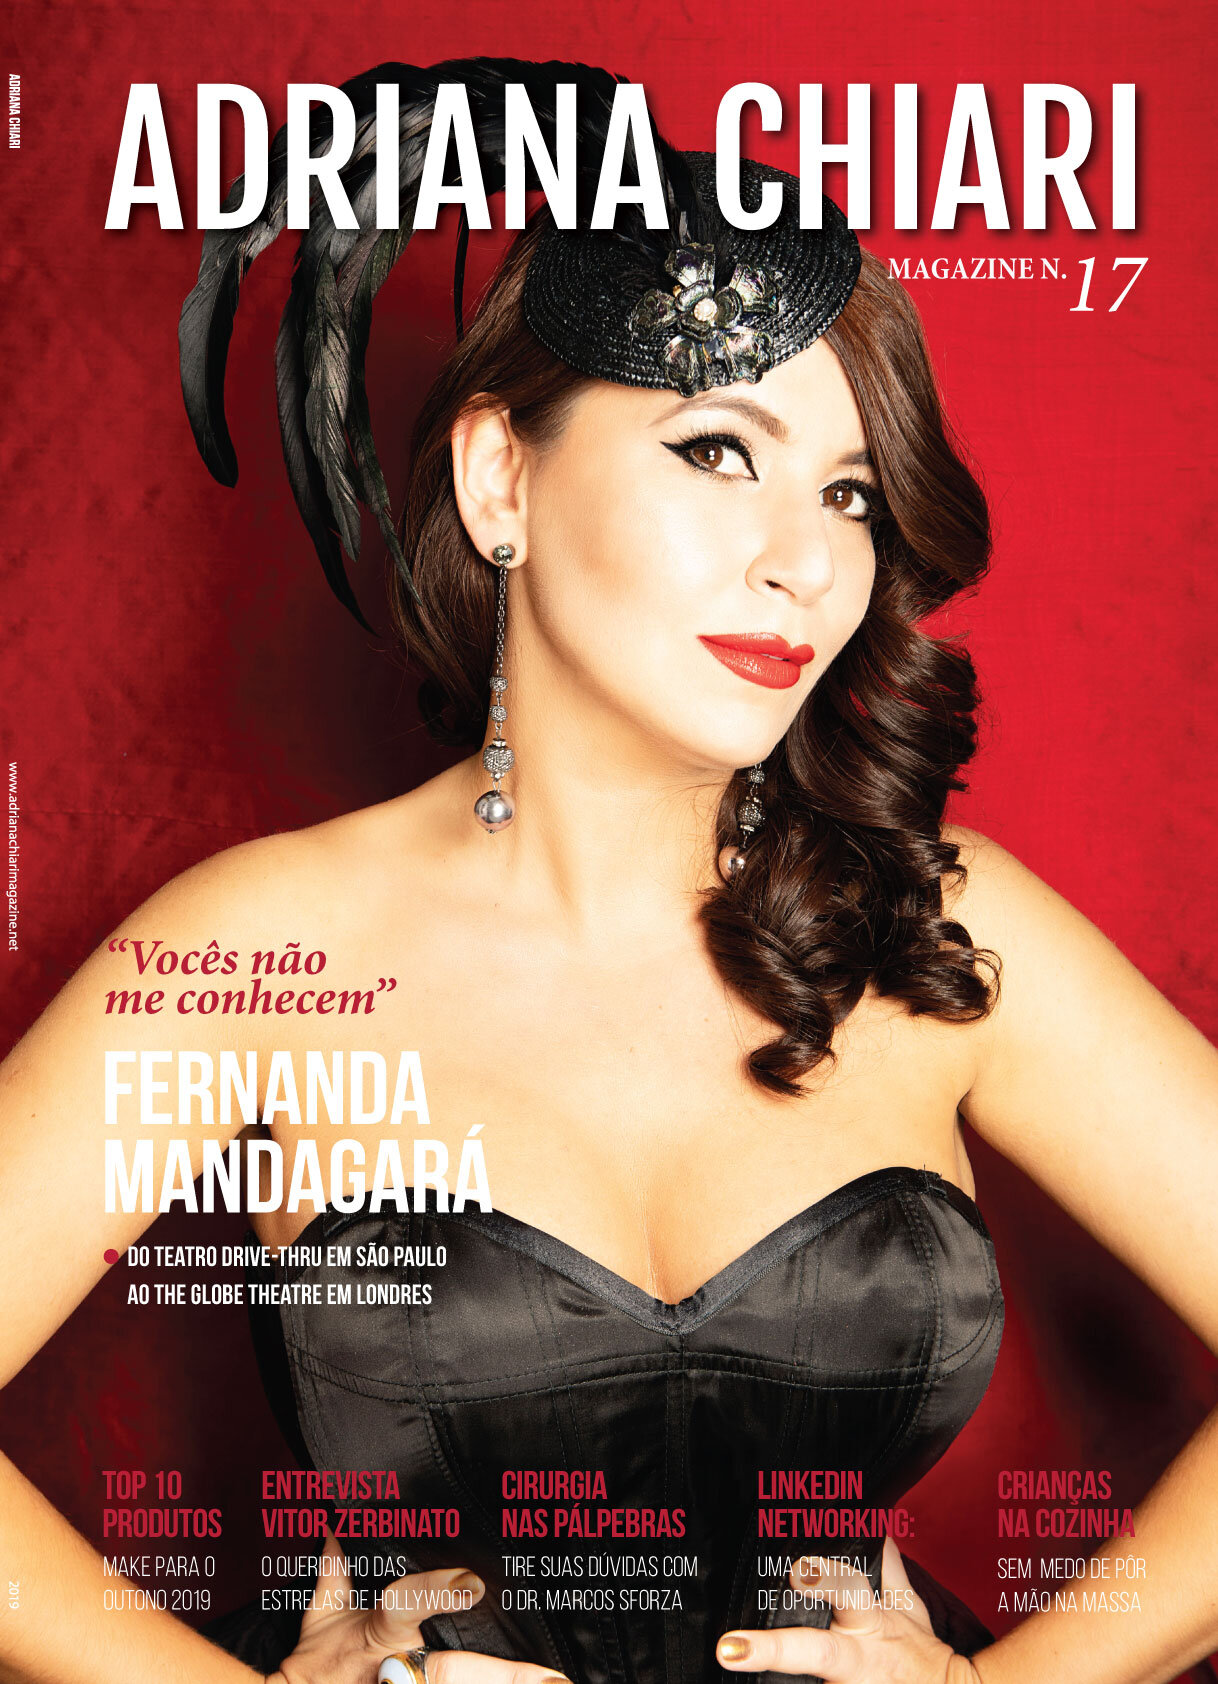 17ª Edição Adriana Chiari Magazine - Setembro - 2019